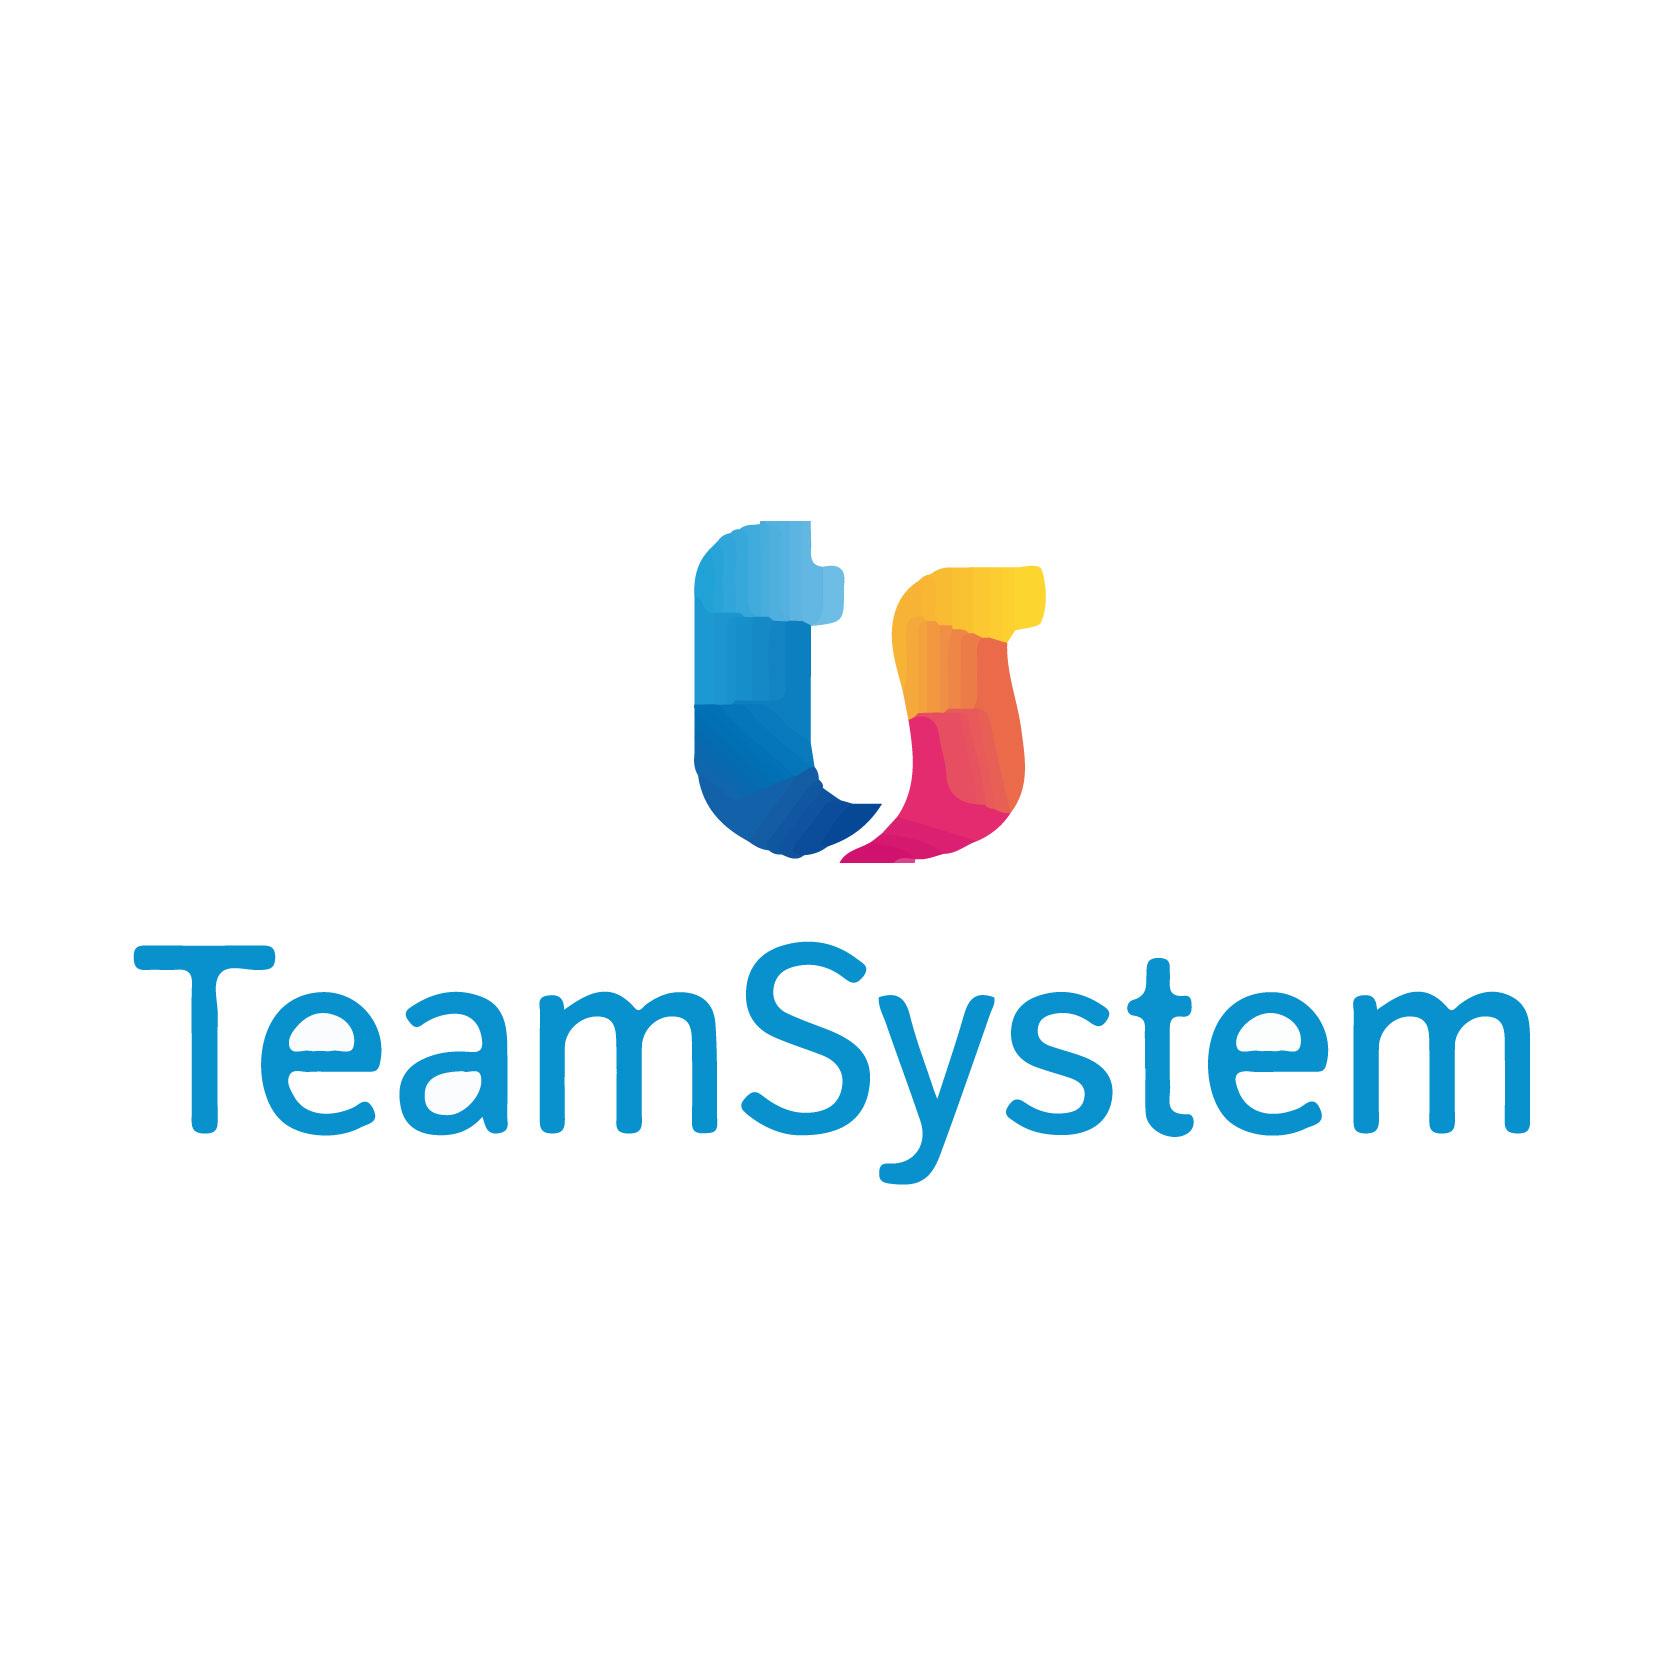 Teamsystem Reggio Emilia